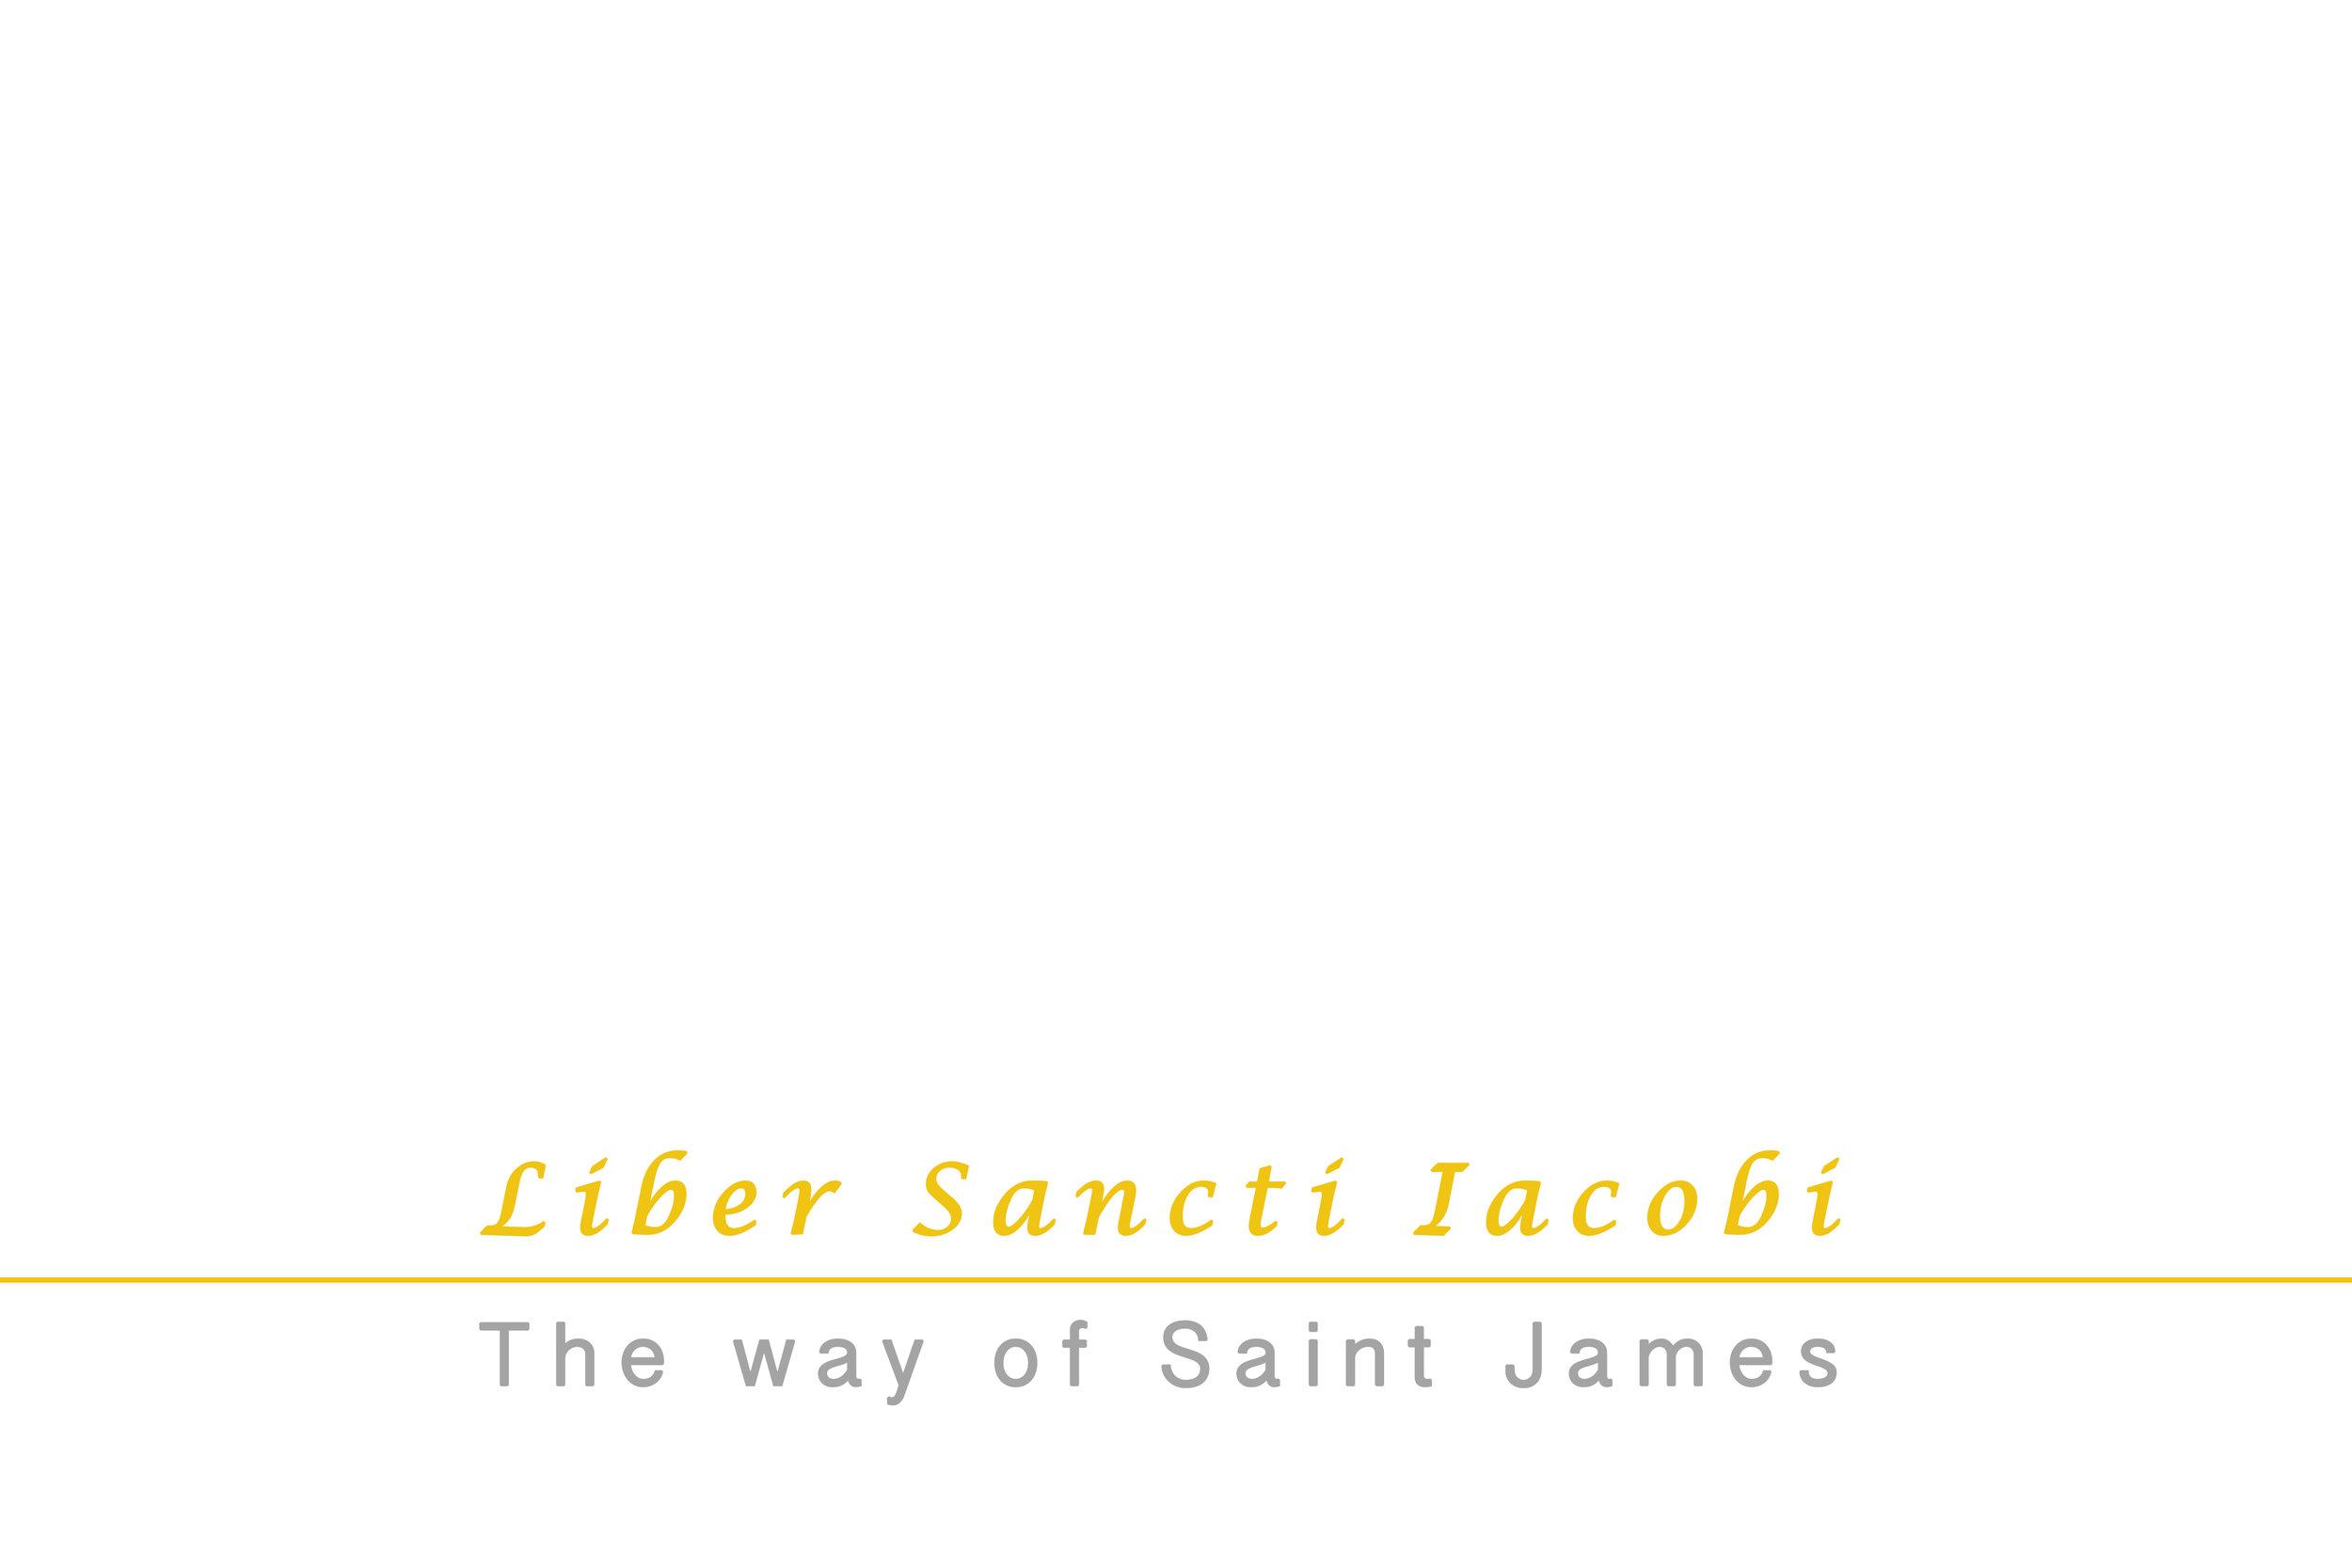 Liber Sancti Iacobi00.jpg